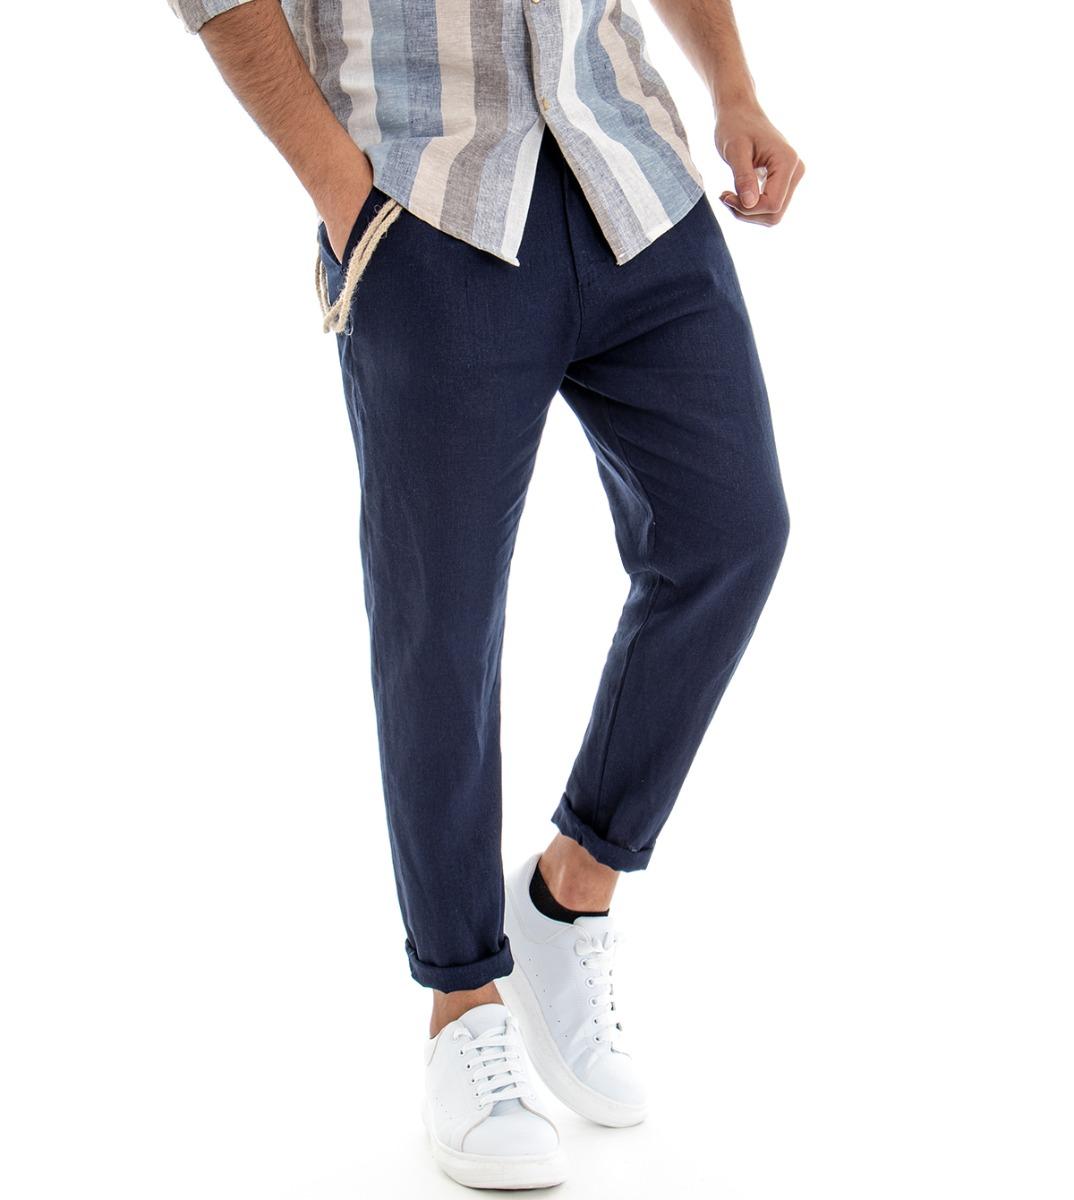 Pantalone-Uomo-Tinta-Unita-Blu-Tasca-America-Cavallo-Basso-Misto-Lino-Viscosa miniatura 2